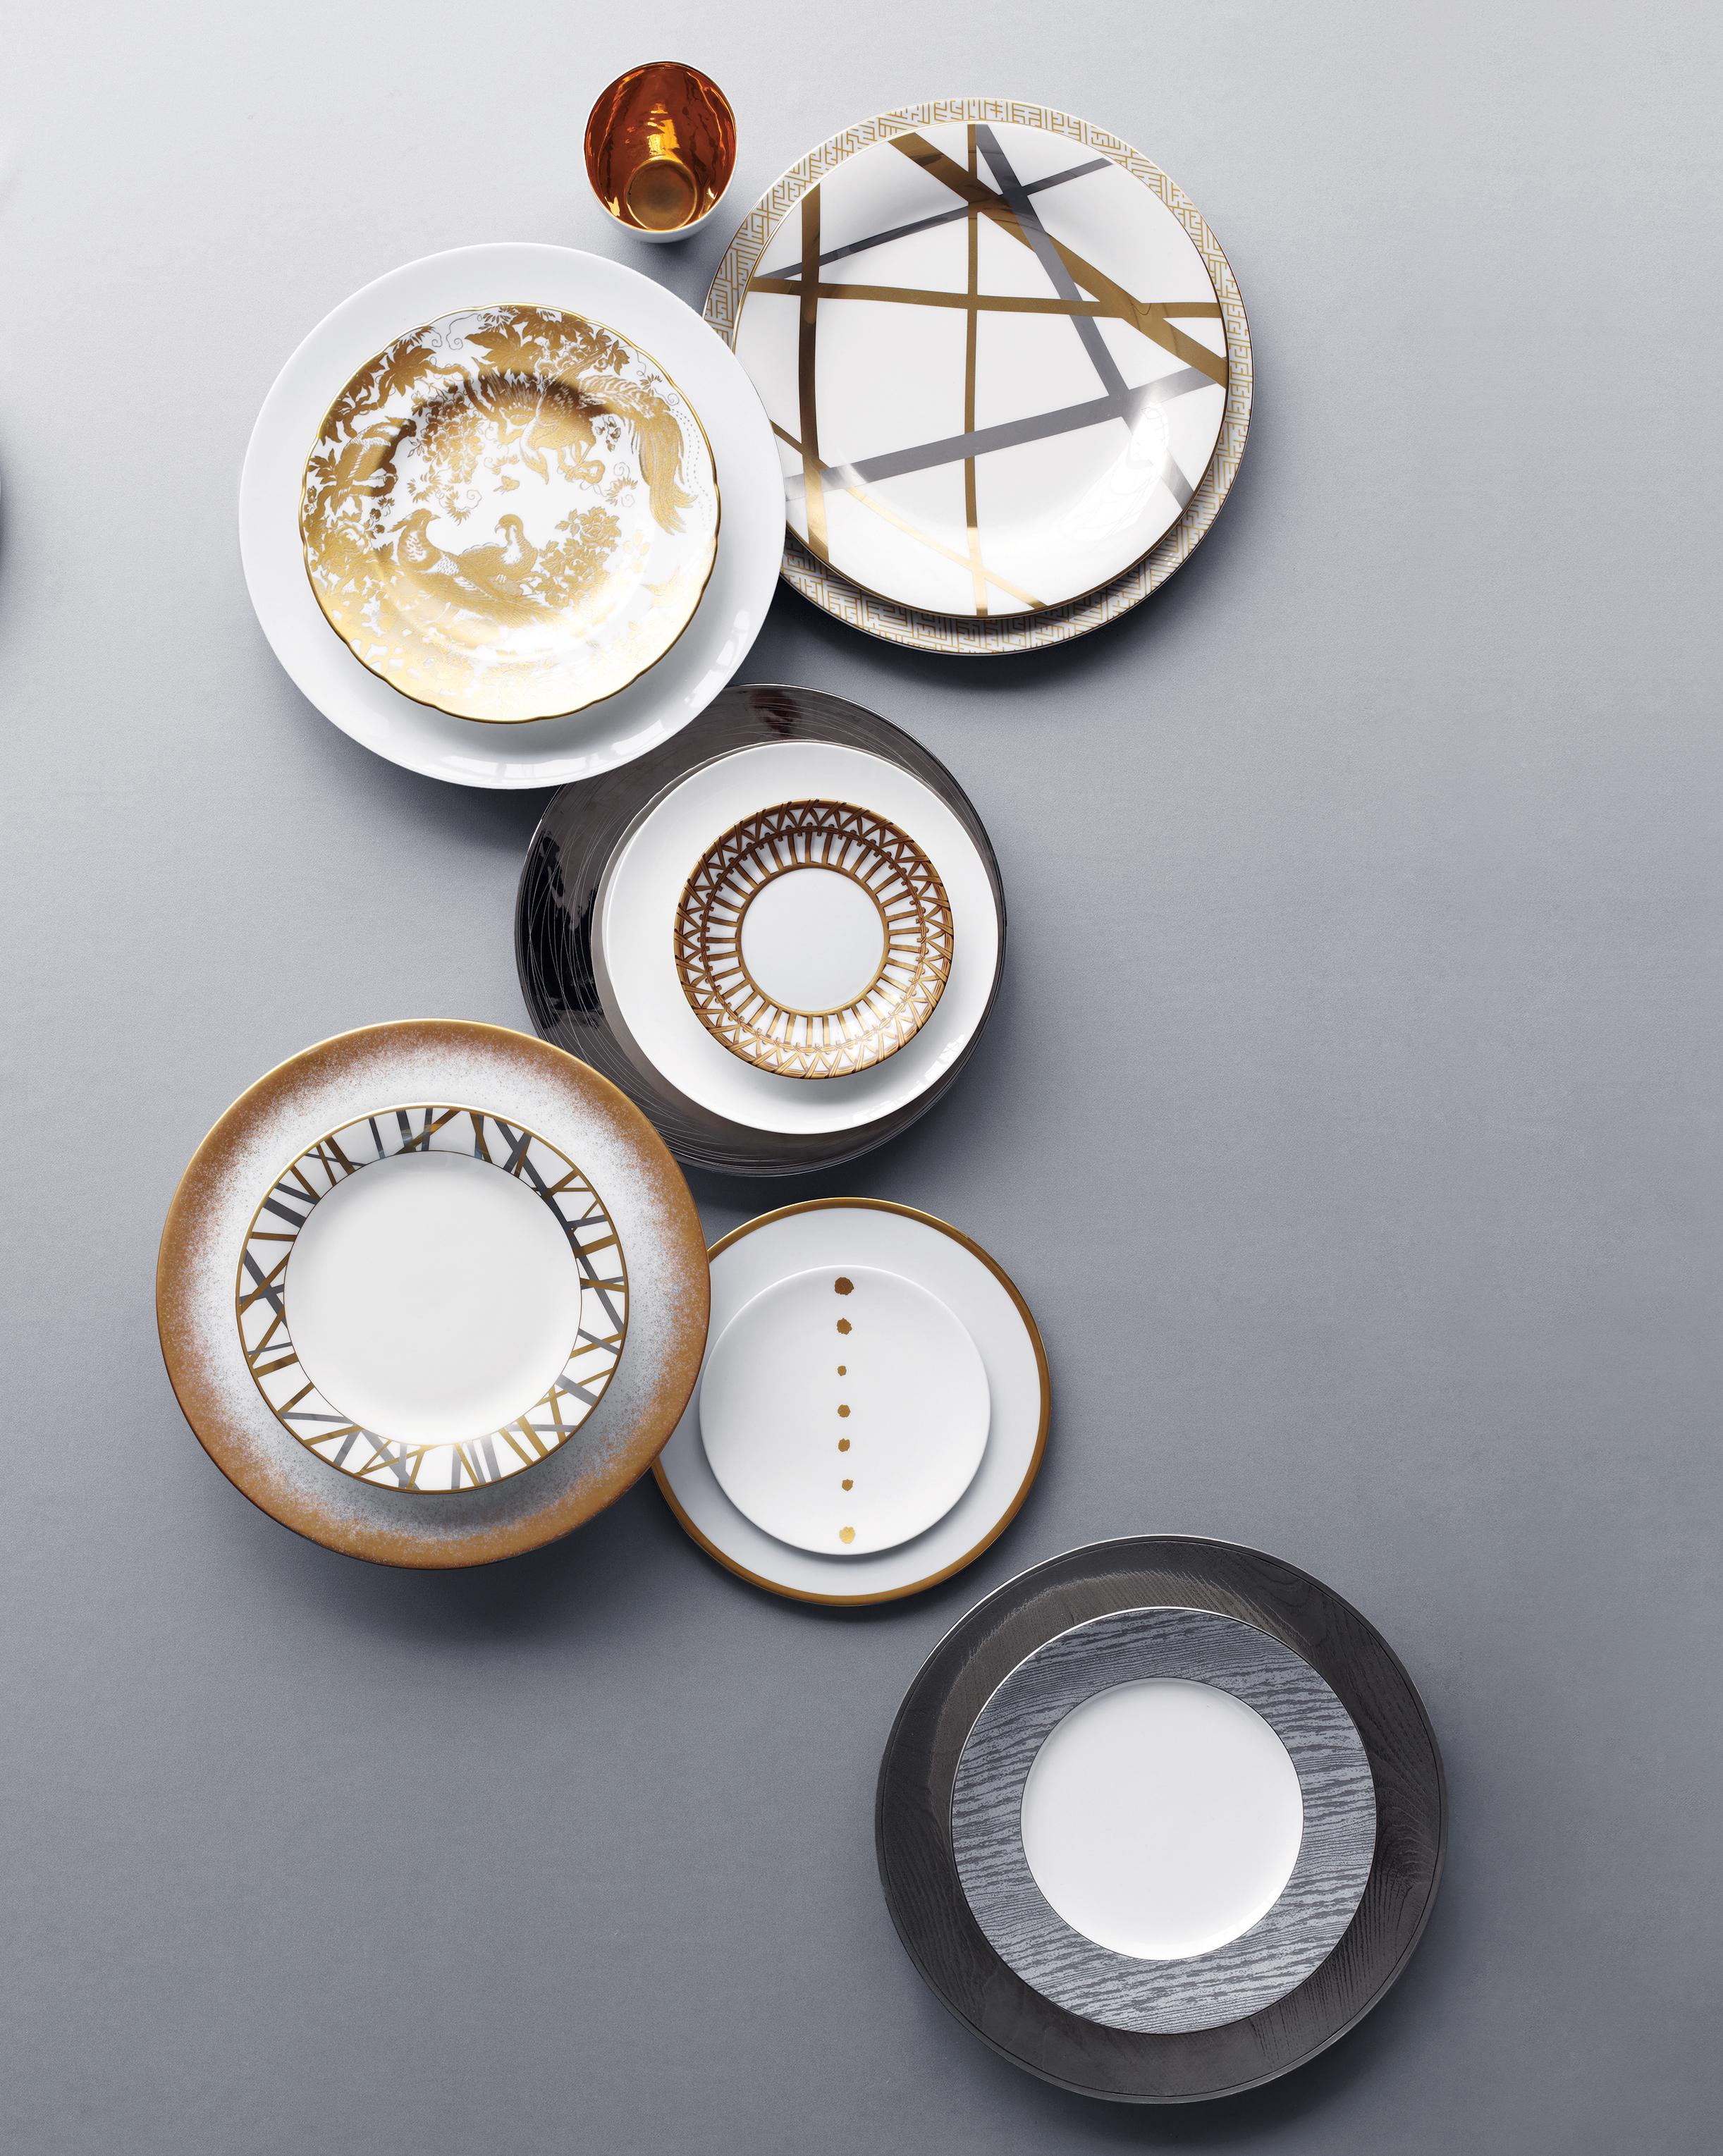 clooney-metallic-plates-0914.jpg